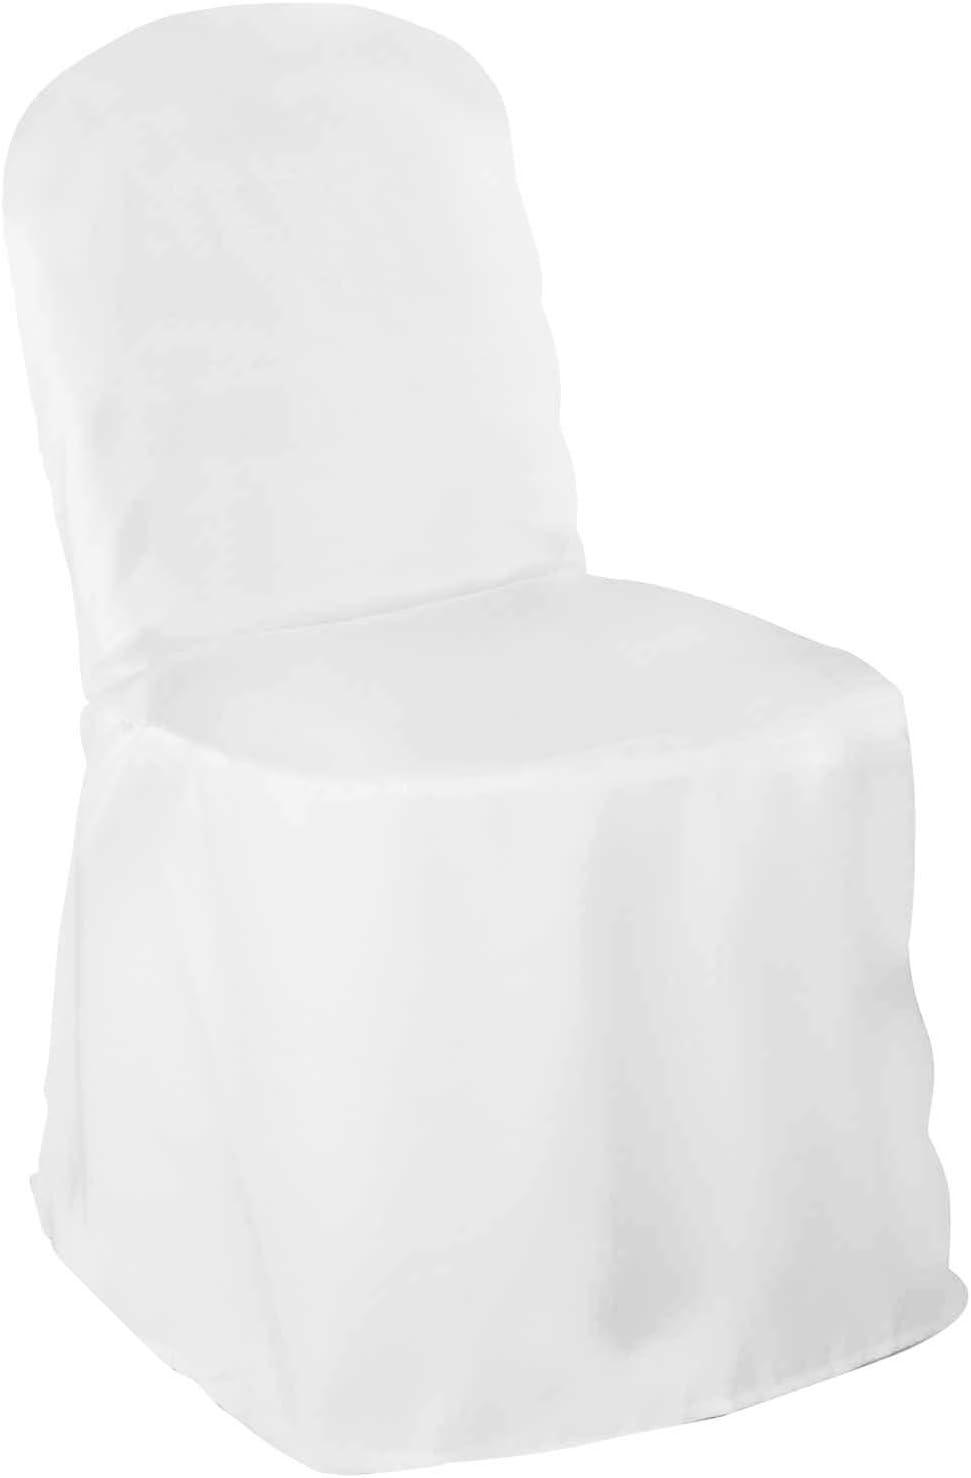 Lann's Cheap bargain Linens. - 10 Wedding Chair Covers sale Polyest Banquet White